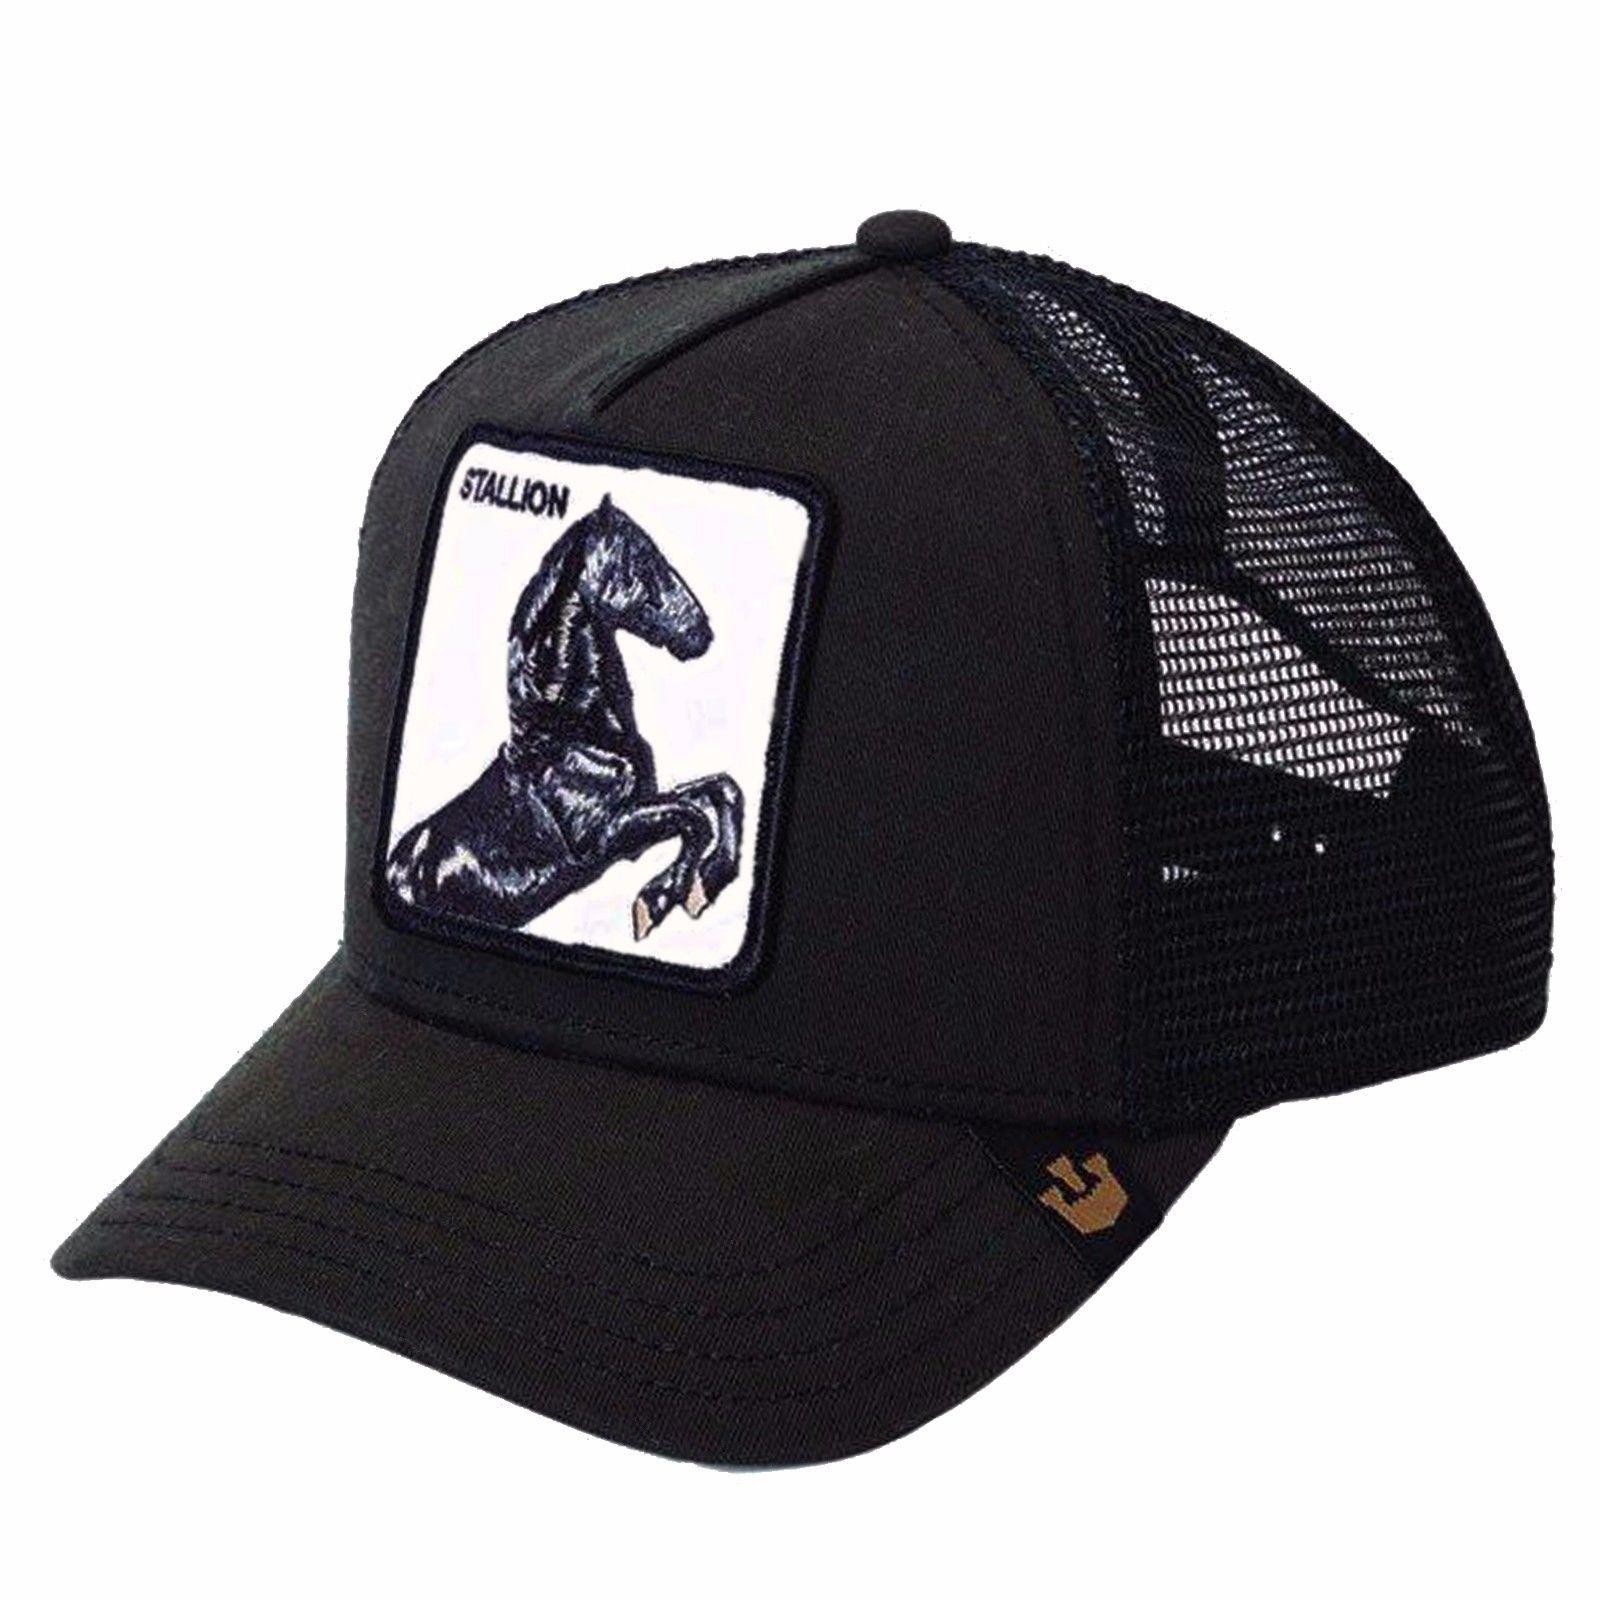 Goorin Bros Animal Farm Trucker Snapback Hat Cap Black Stallion Goorin Hats Cowboy Style